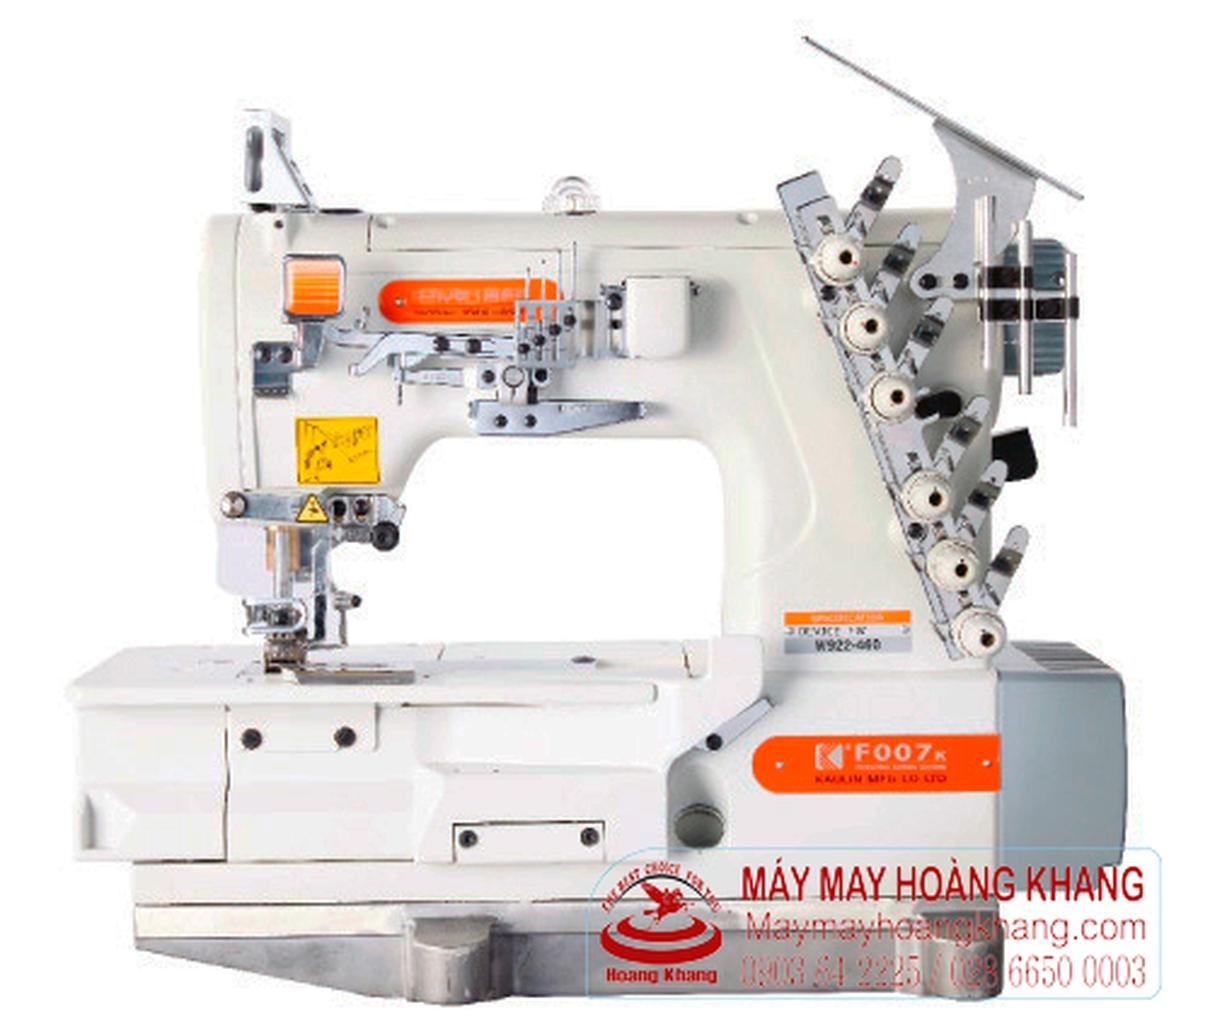 Máy viền bằng SIRUBA F007K-W122-356/FHA